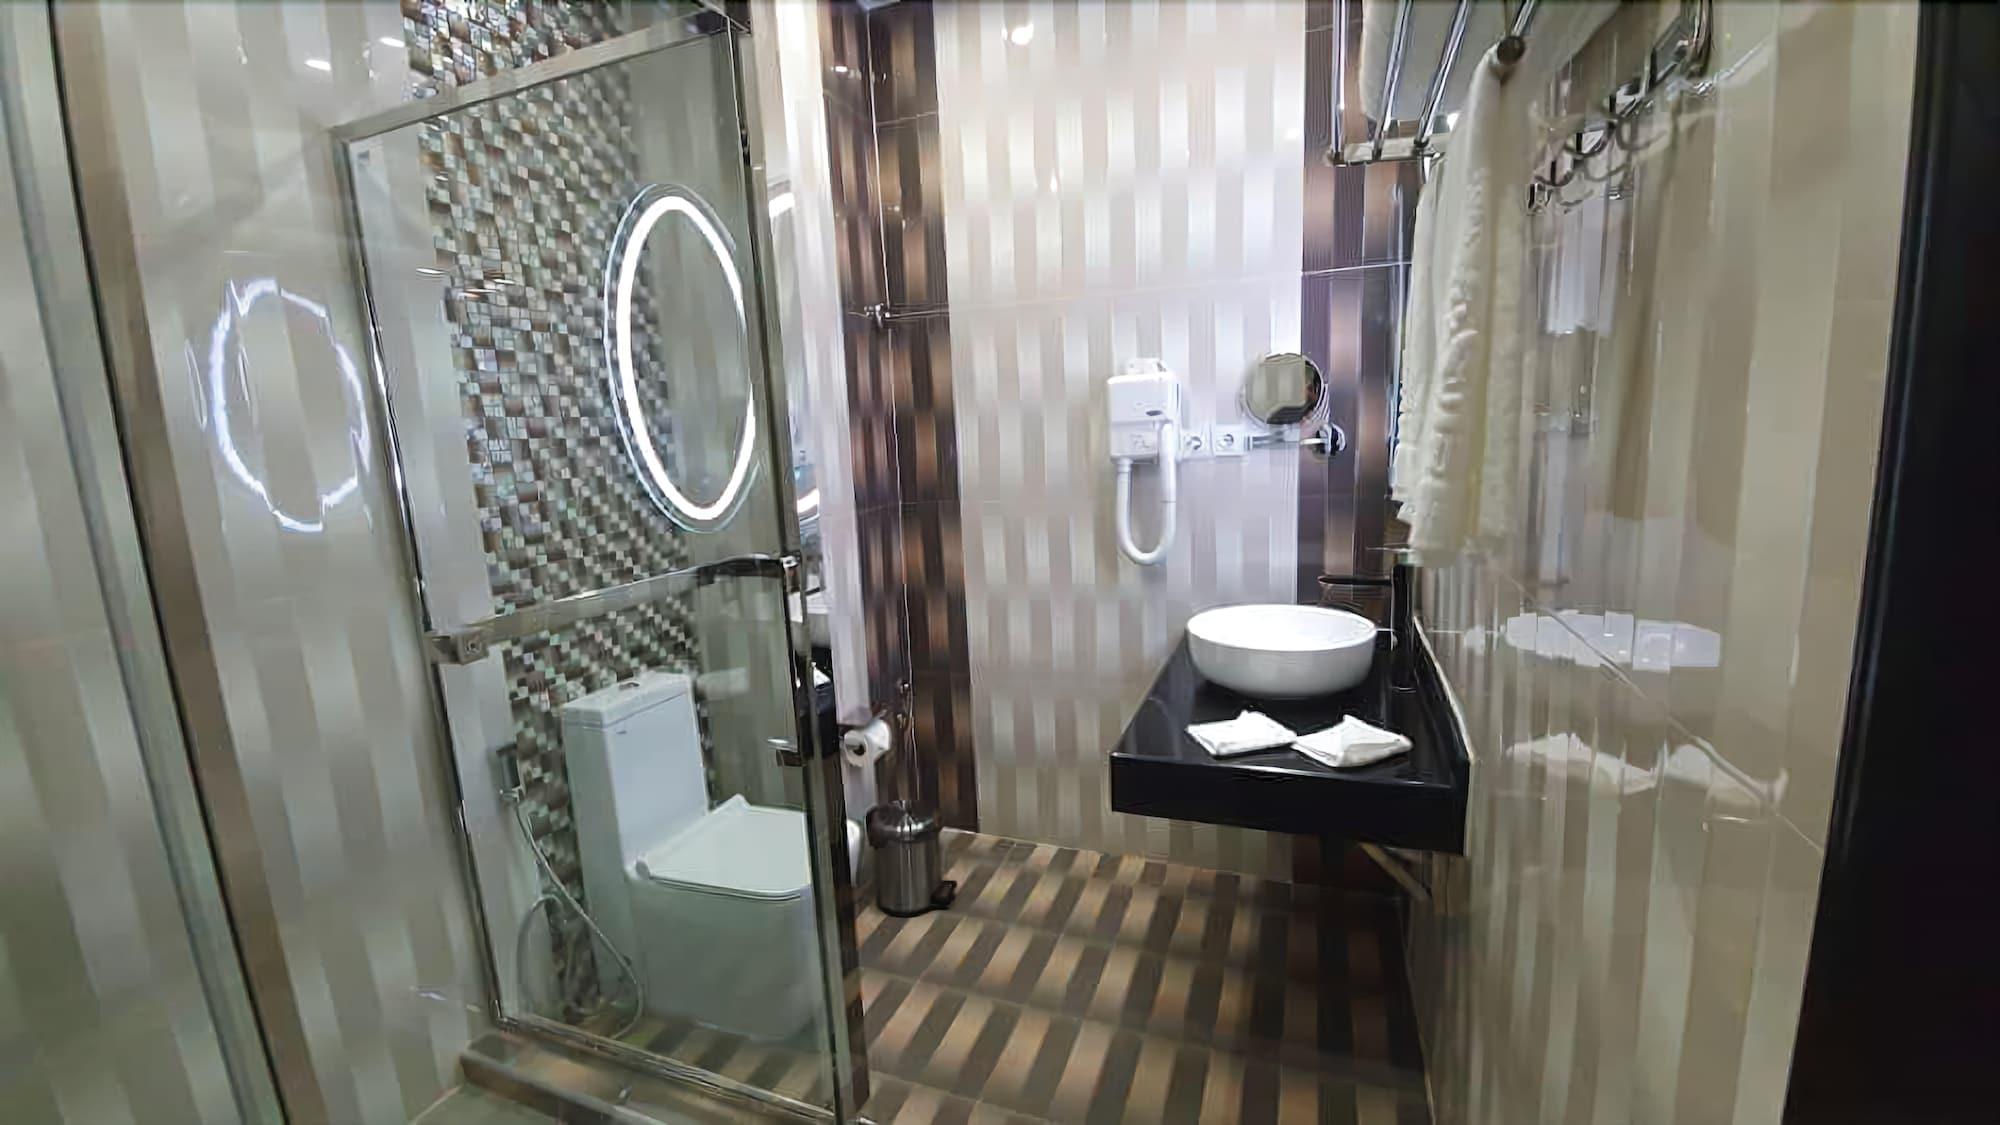 Indico Executivo Hotel, Nacala Velha